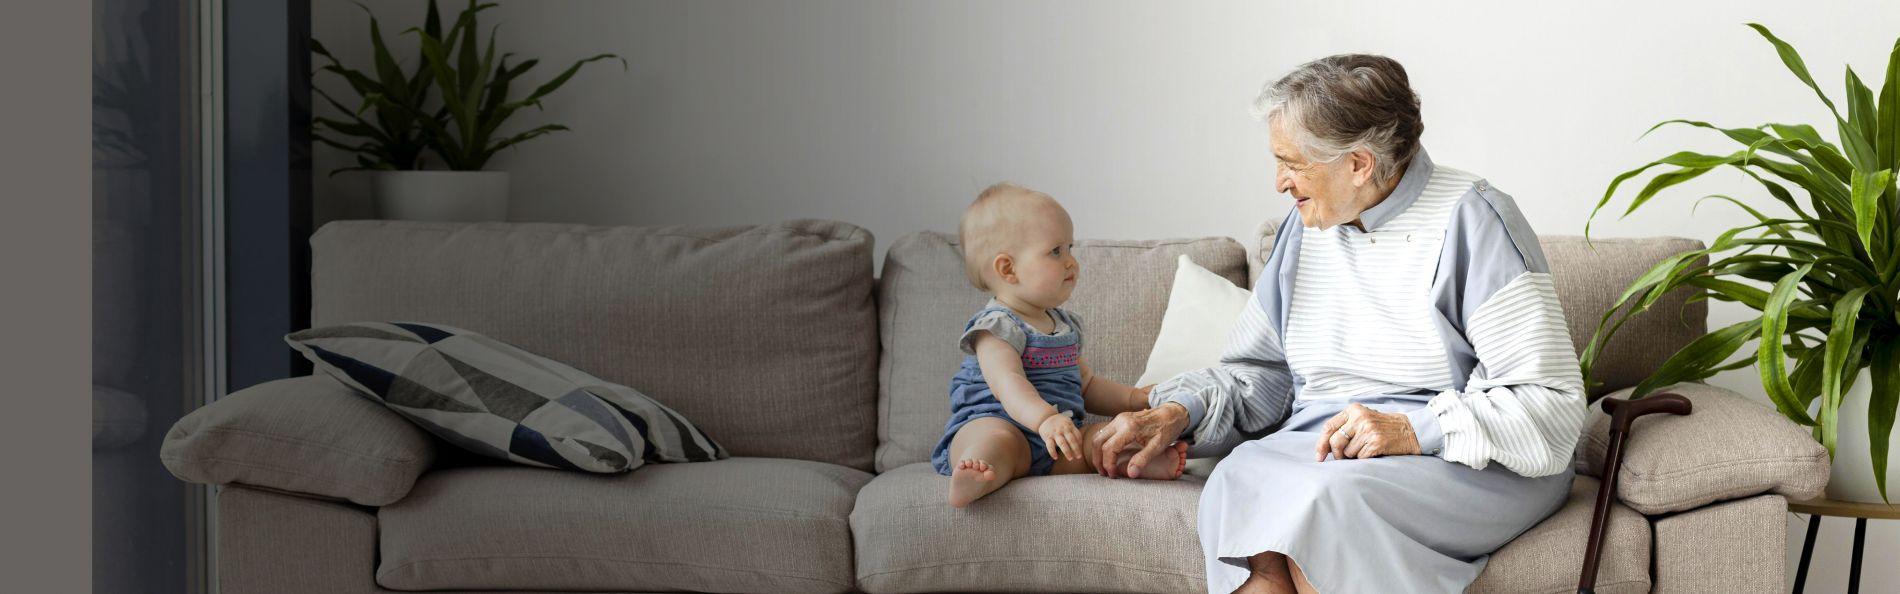 Кредит под залог без истории пенсионерам на недвижимость